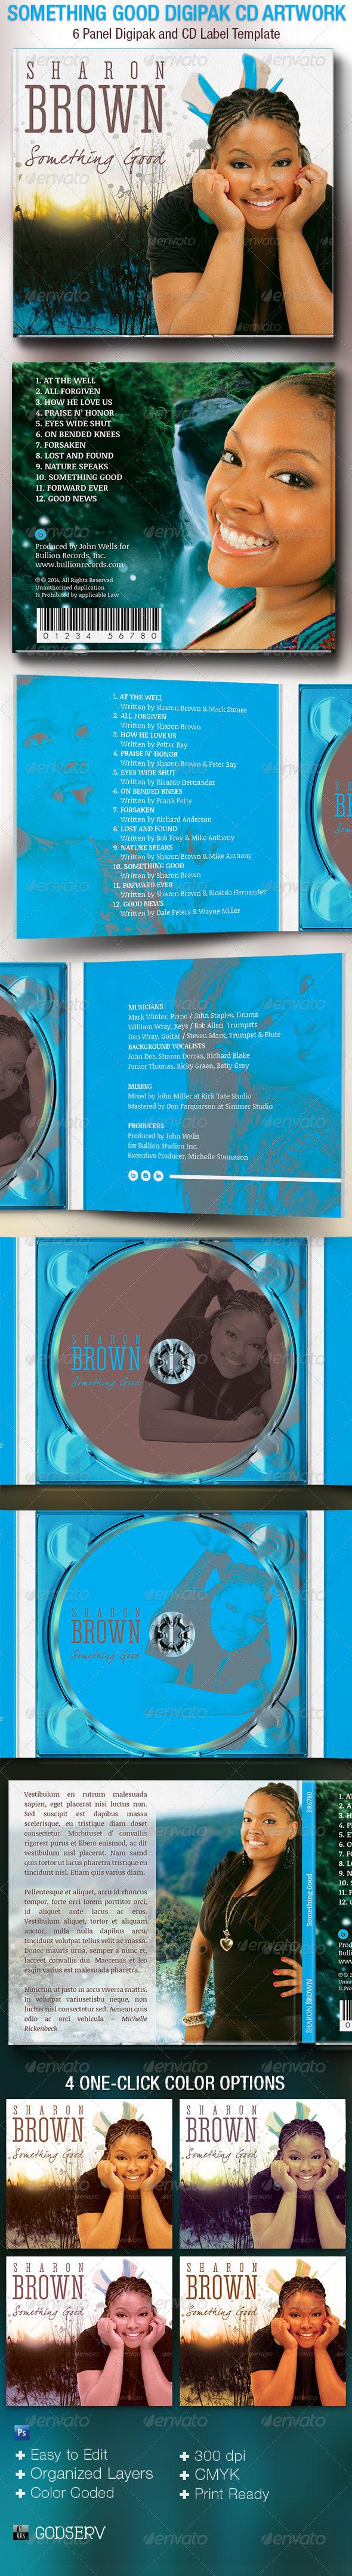 Something Good 6 Panel Digipak CD Artwork Template - CD & DVD Artwork Print Templates